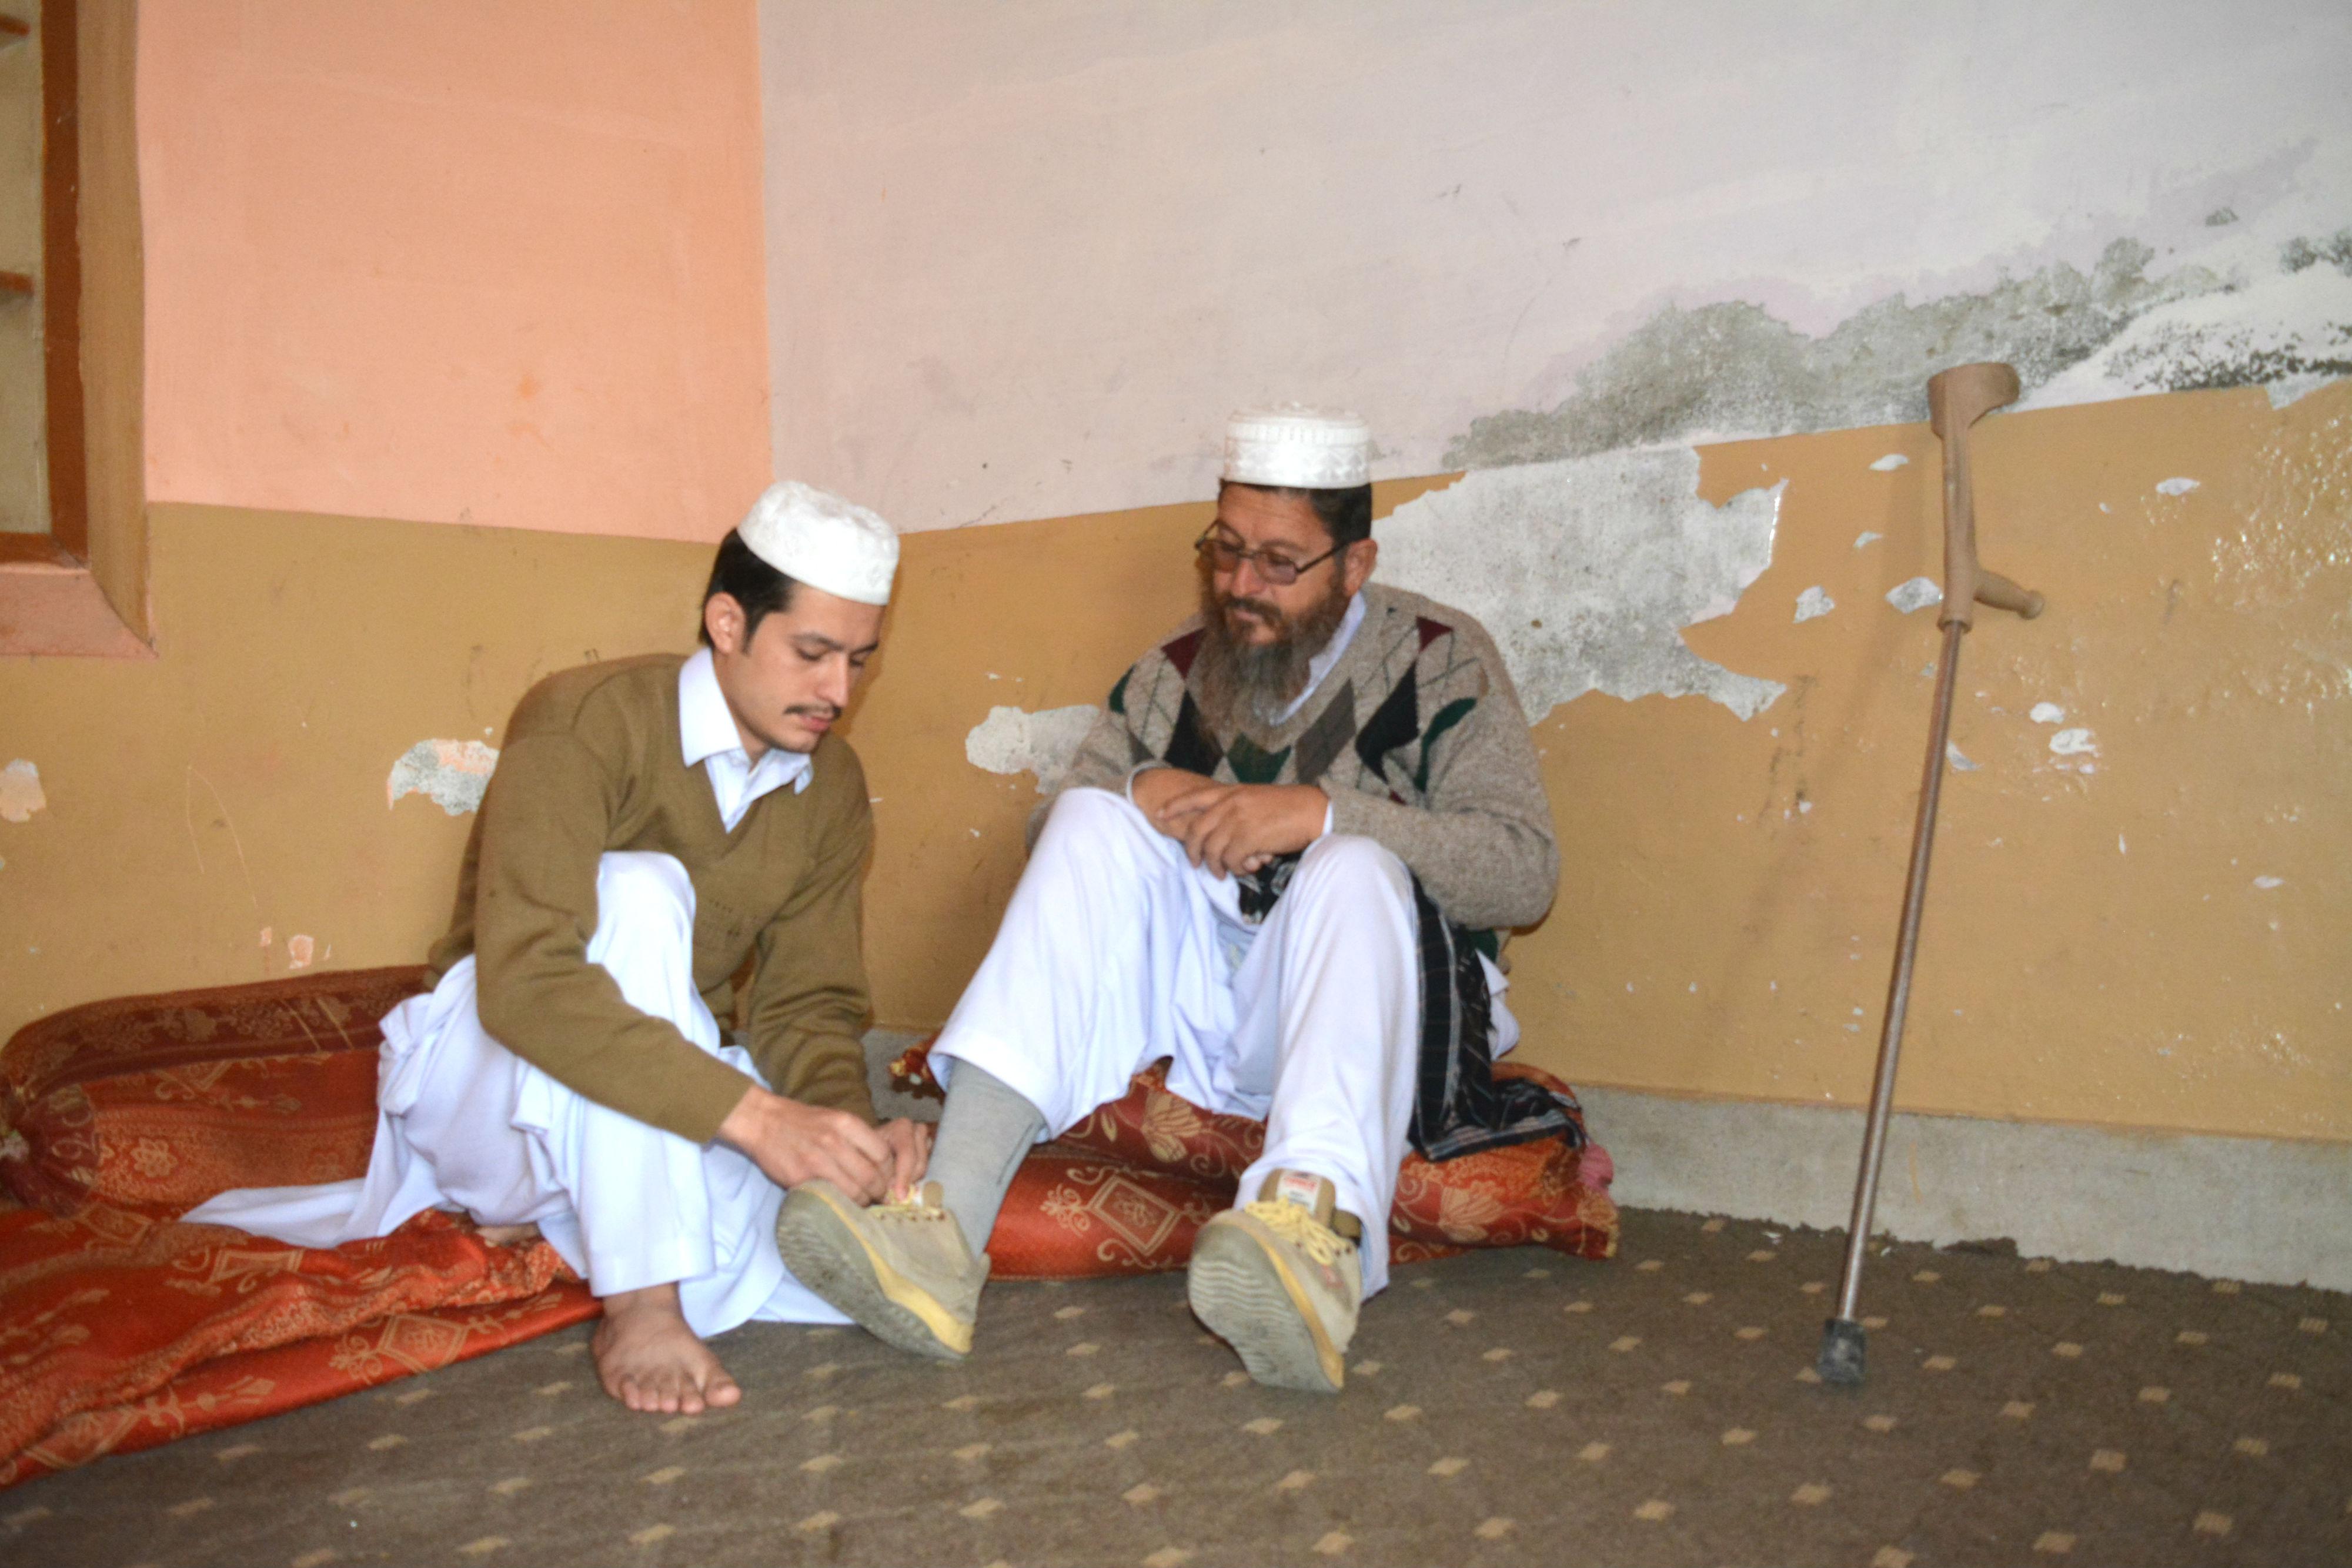 Survivors reflect 7 years after terrorist attack in Peshawar